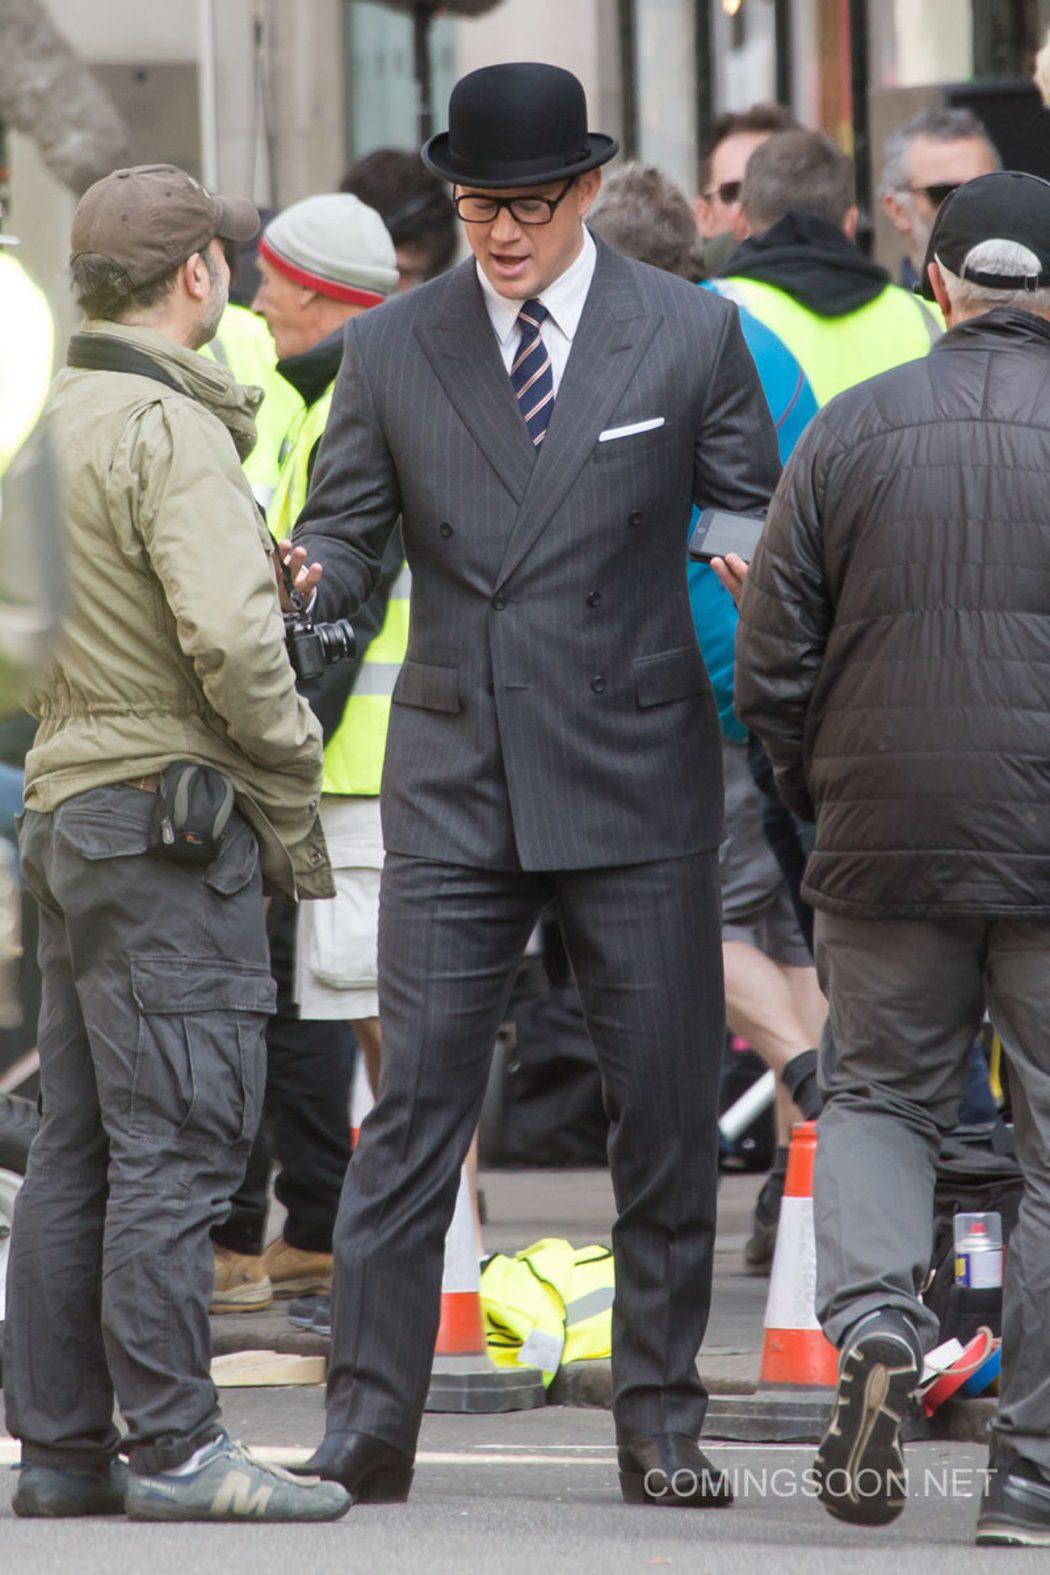 Channing Tatum trajeado como un agente secreto